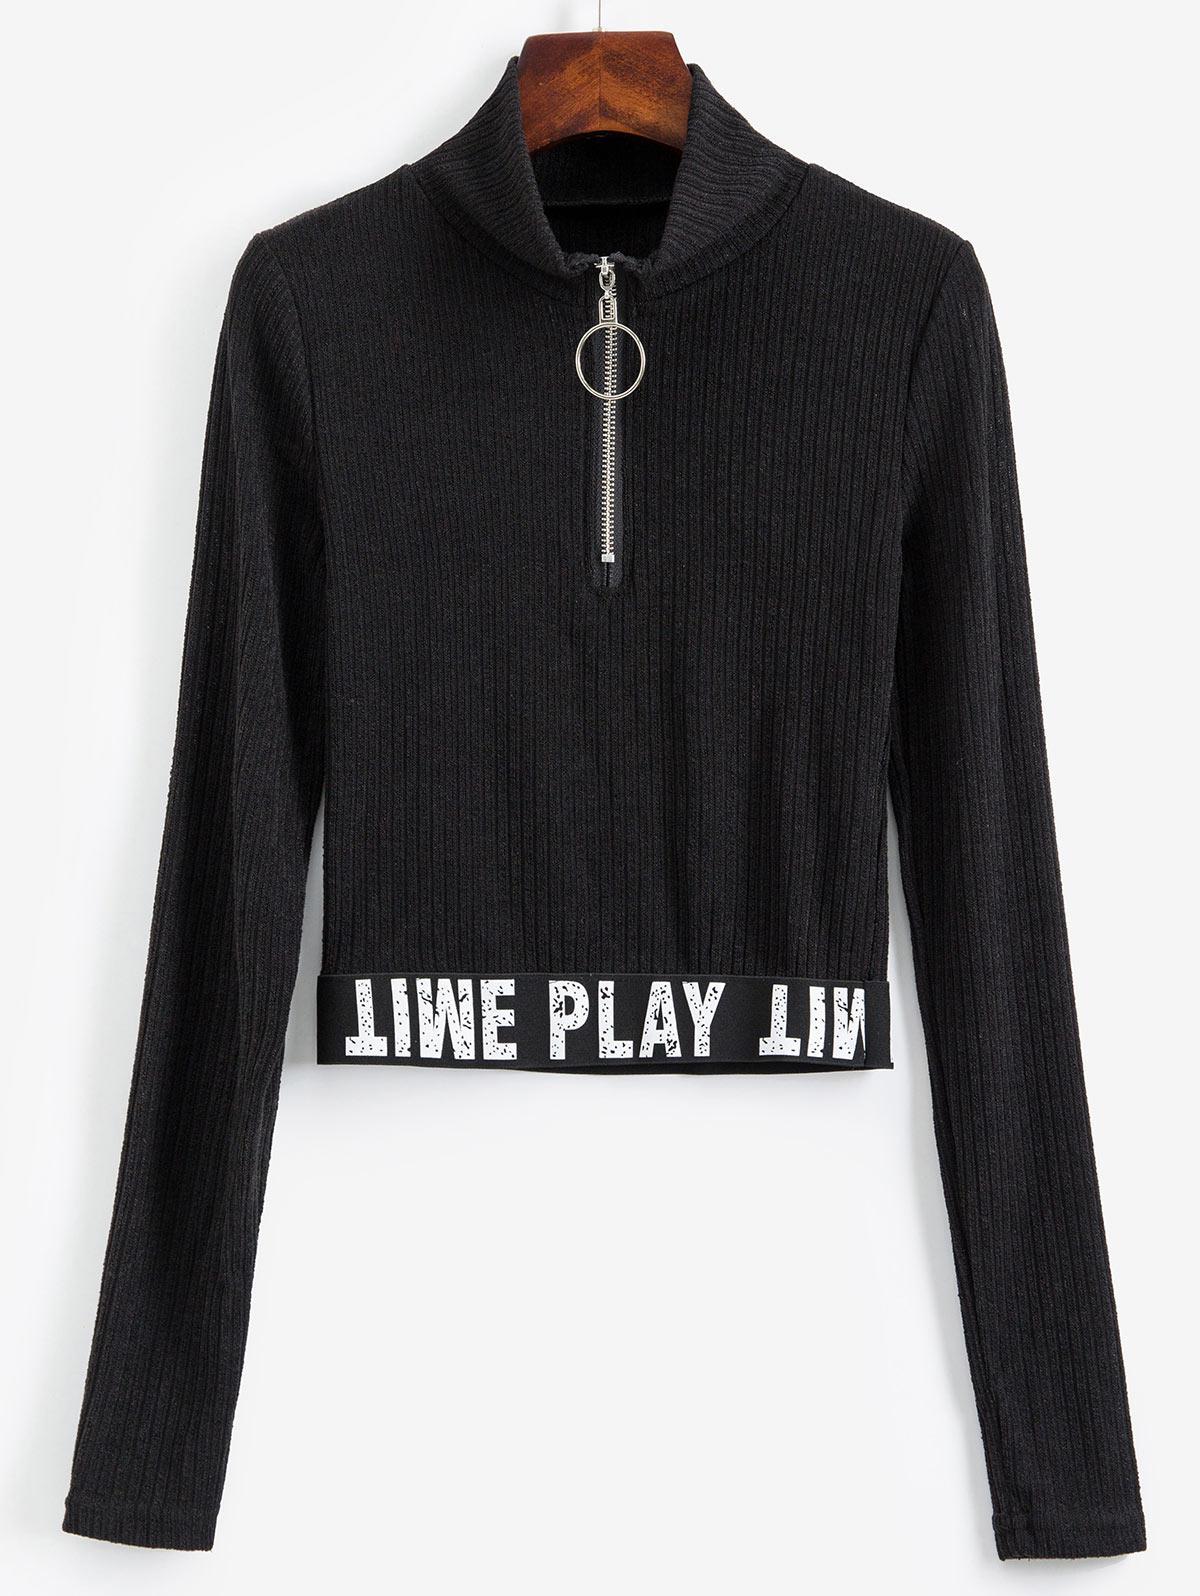 Slogan Graphic Half Zip Ribbed Cropped Knitwear